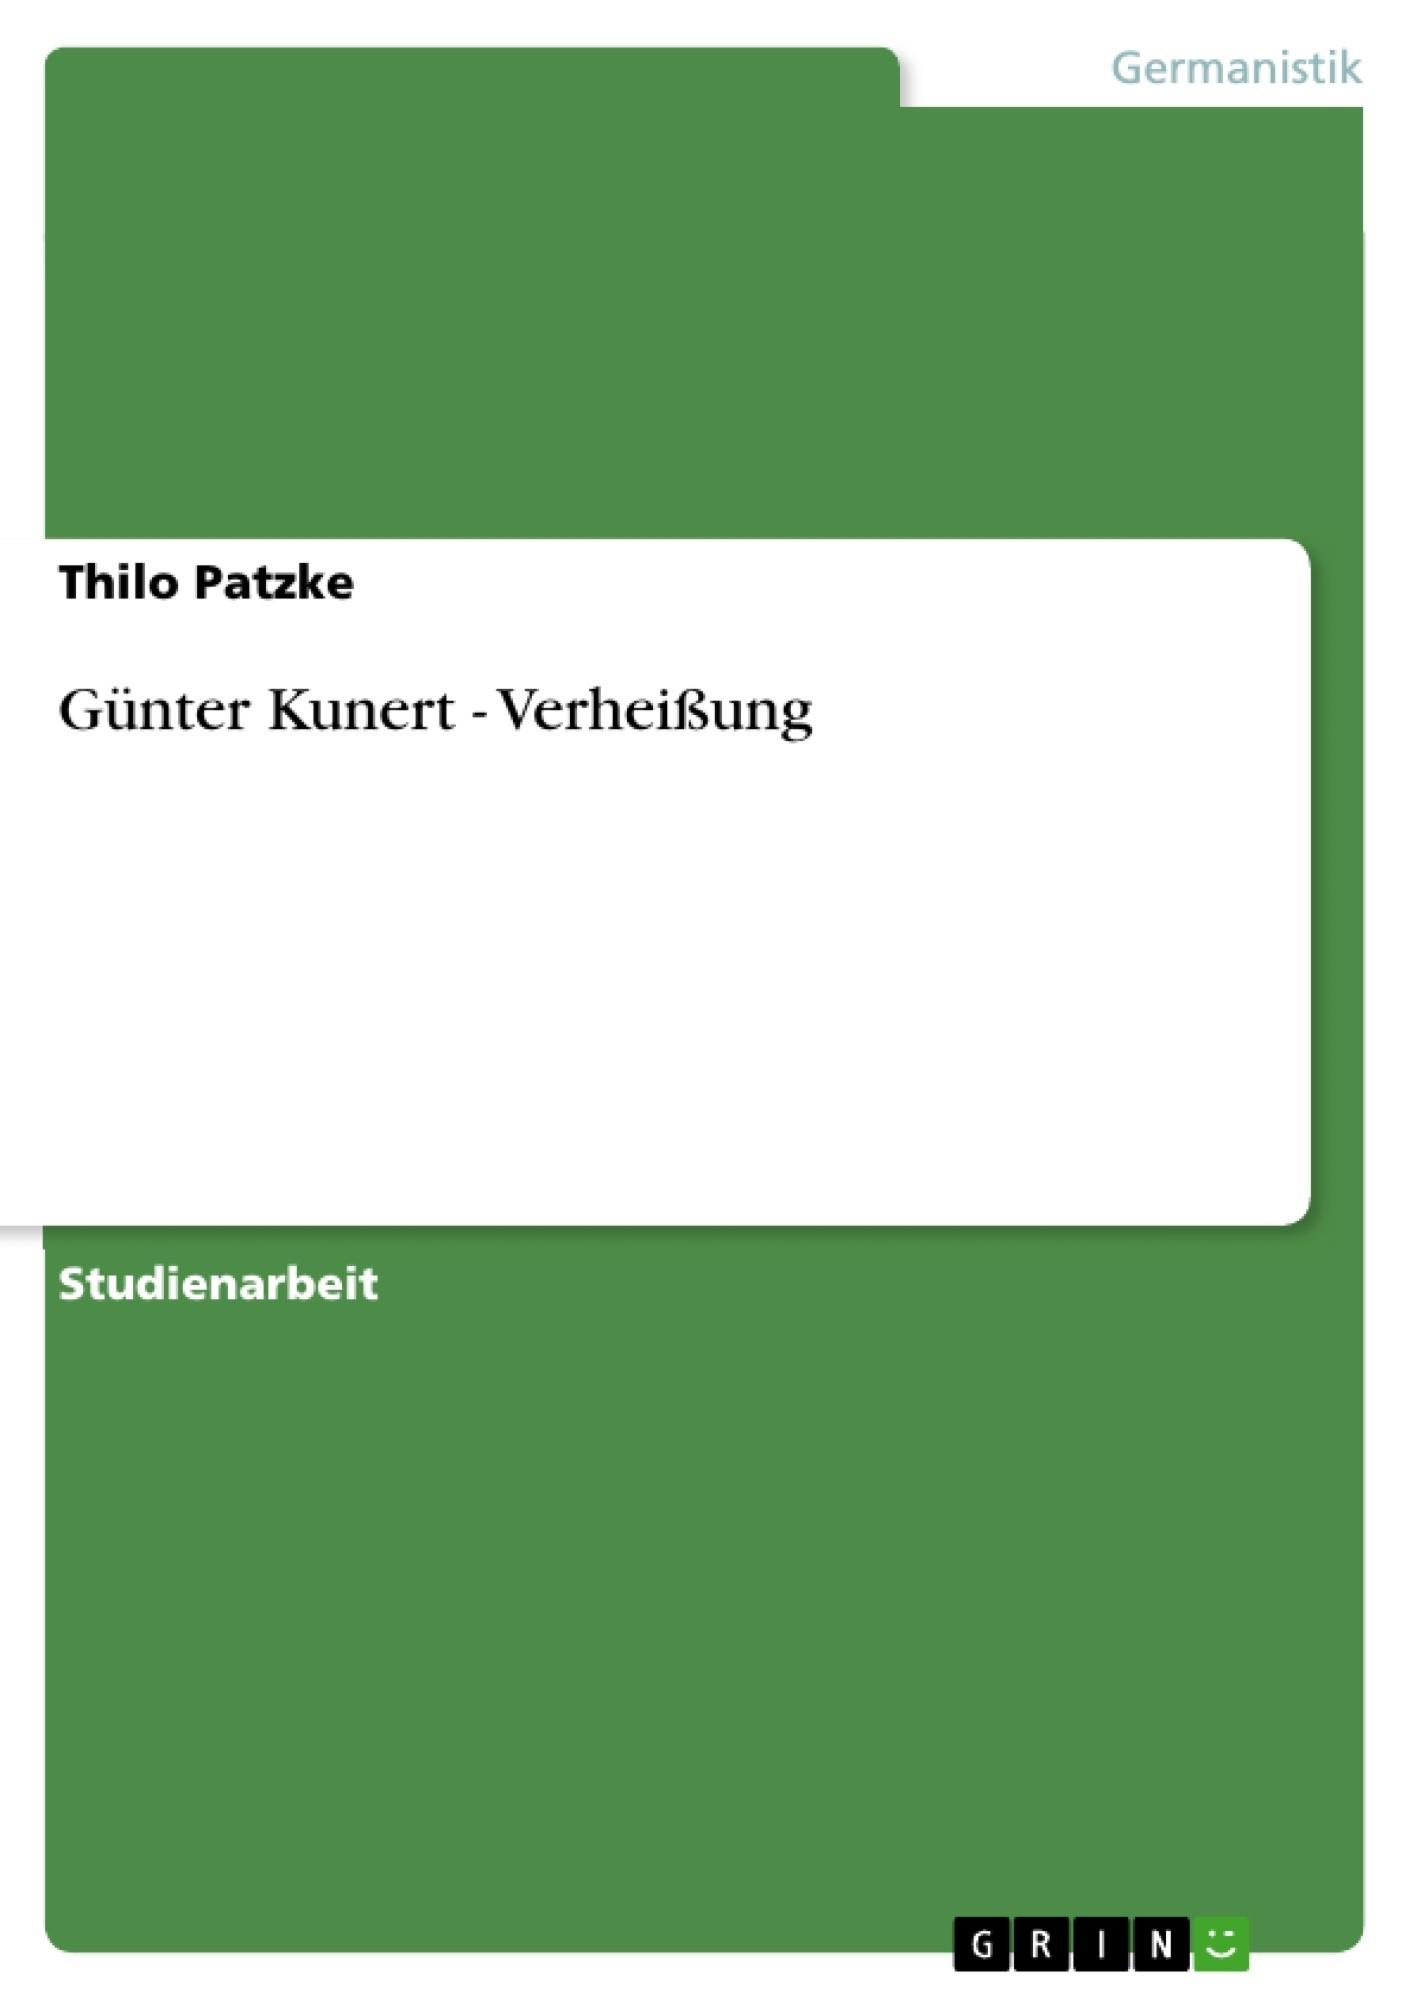 Titel: Günter Kunert - Verheißung